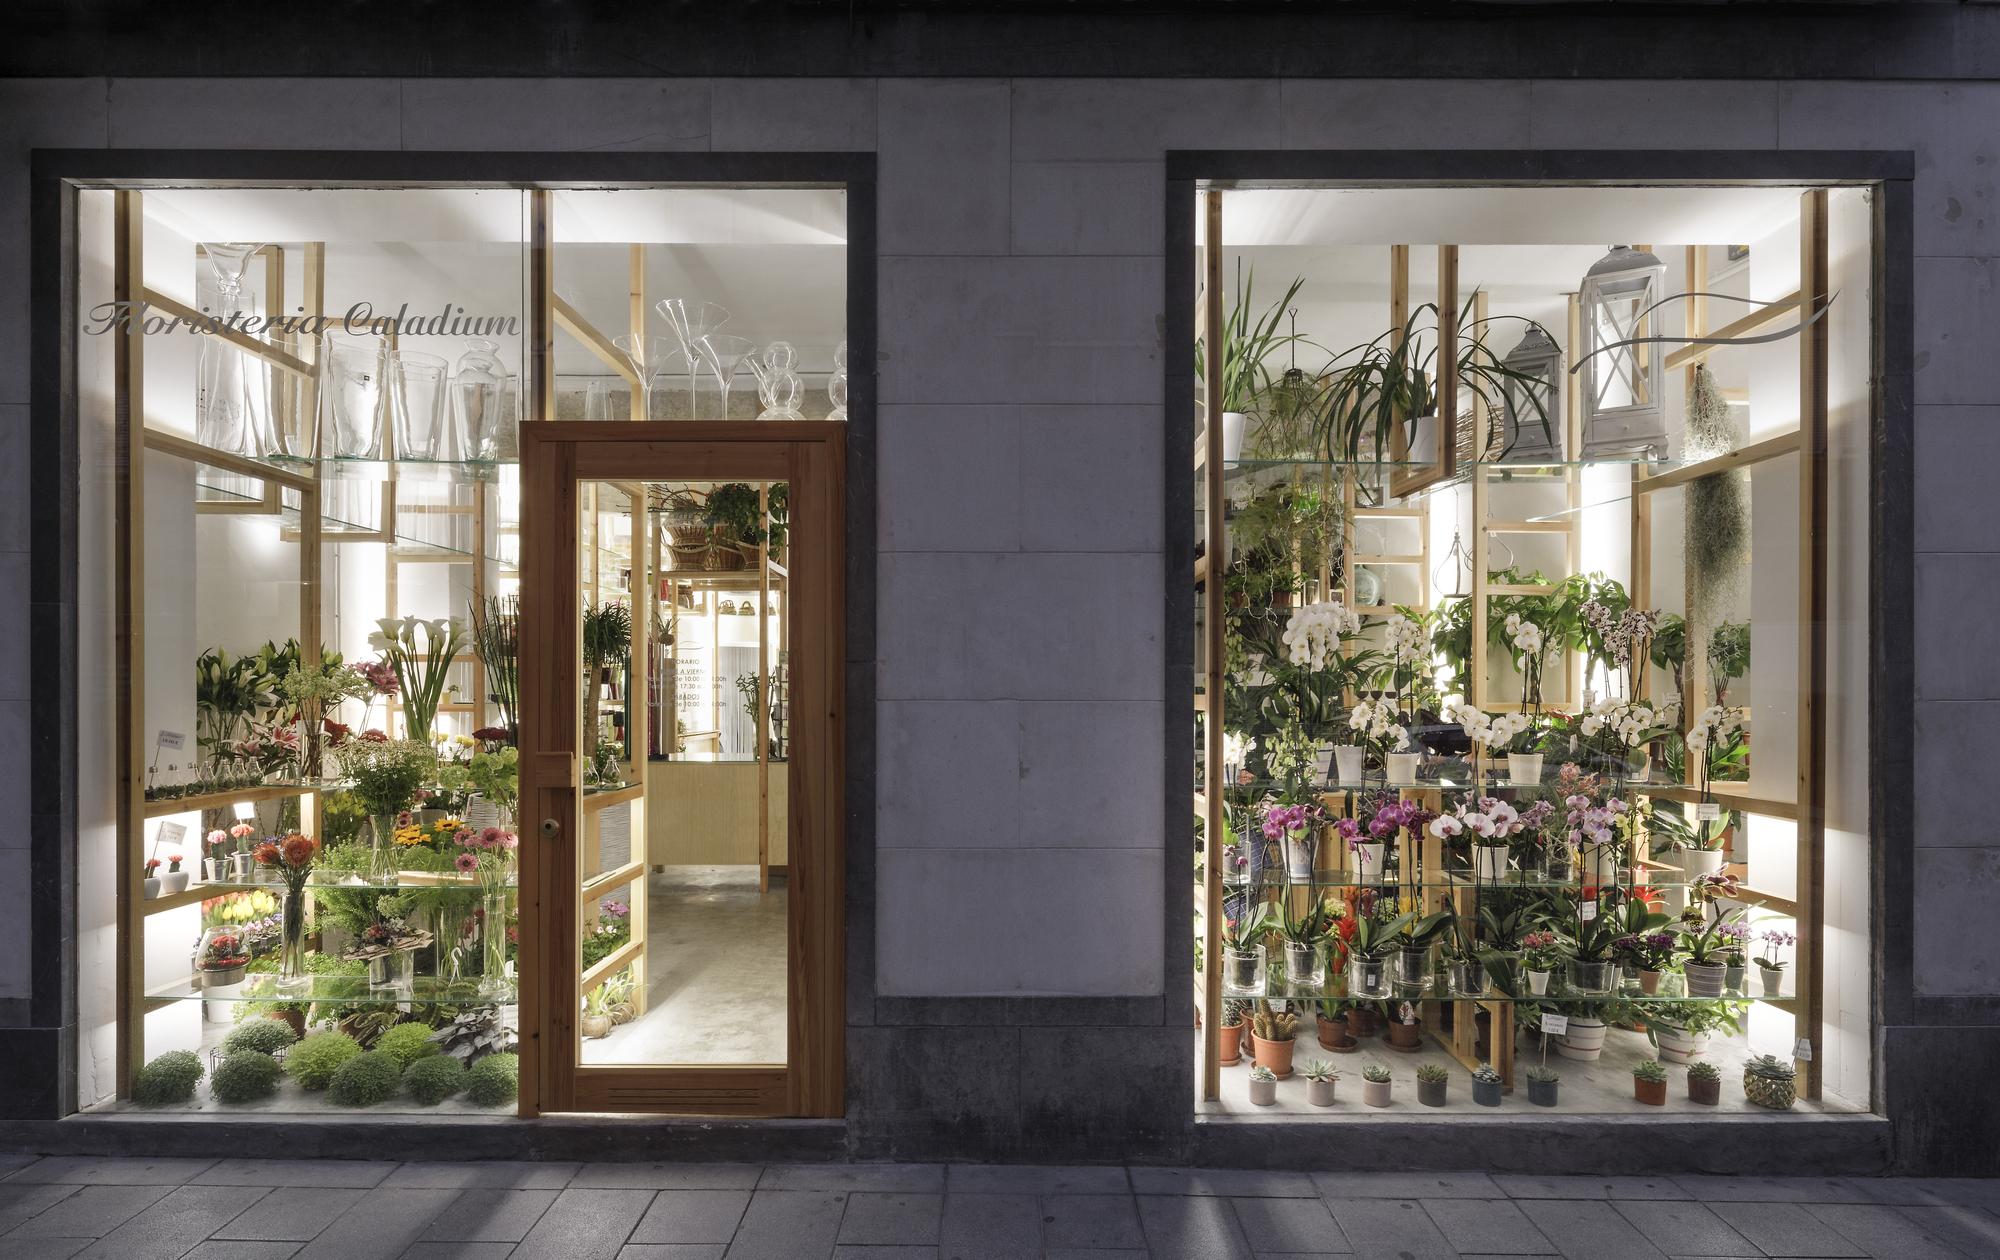 Fernando Alda Fot Grafo Plataforma Arquitectura # Muebles Pedro Baquero